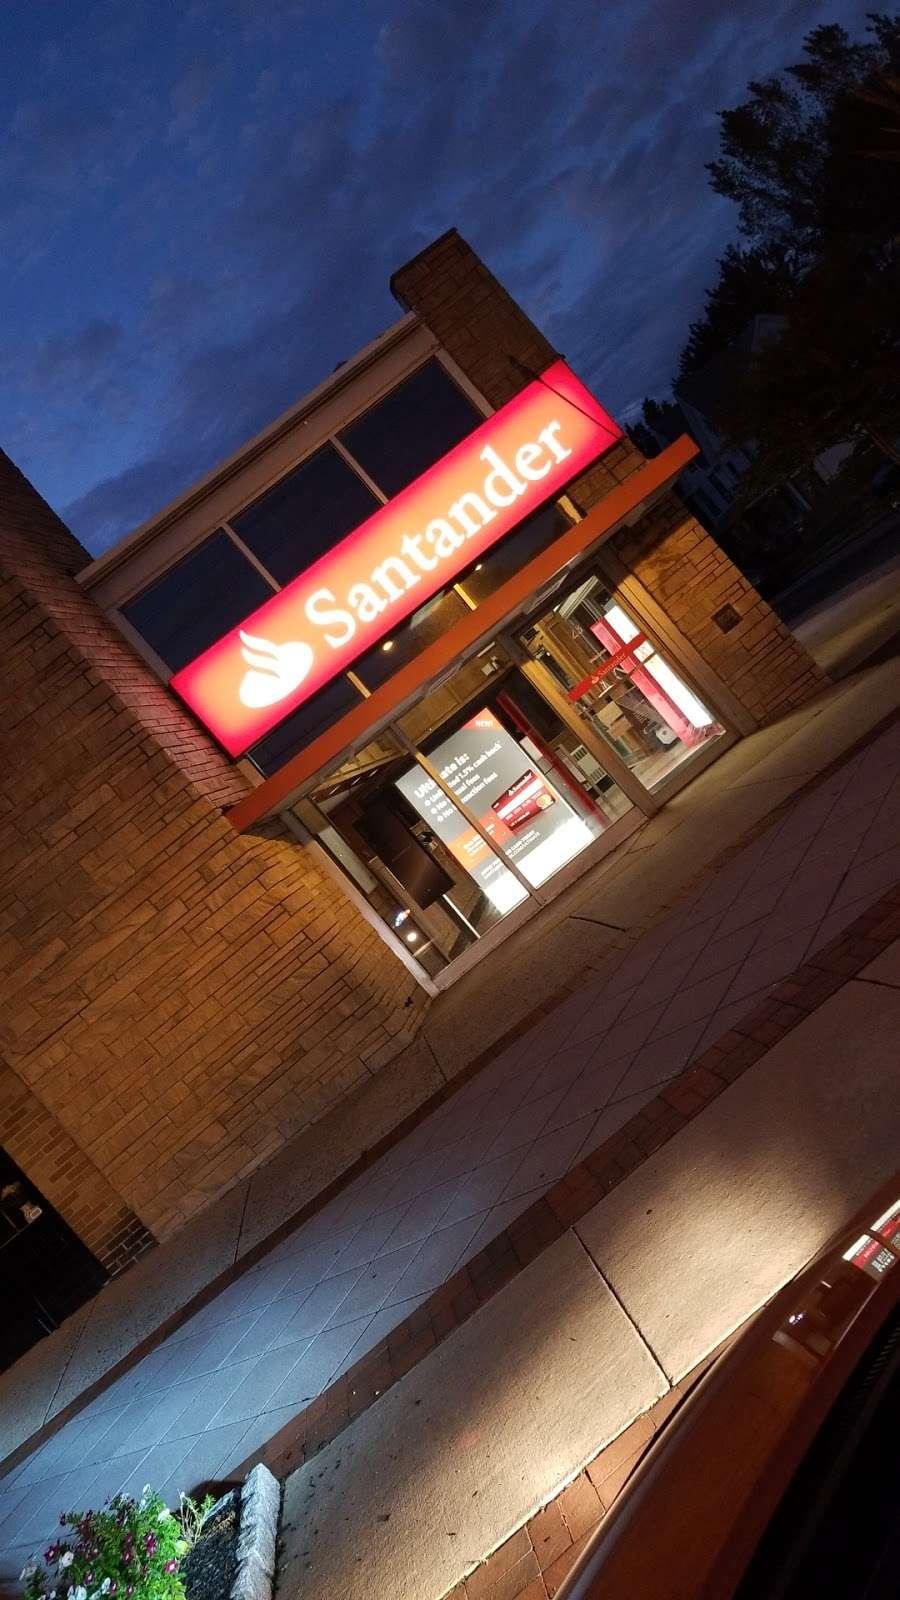 Santander Bank - bank    Photo 1 of 2   Address: 23 E Broad St, Palmyra, NJ 08065, USA   Phone: (856) 829-9393